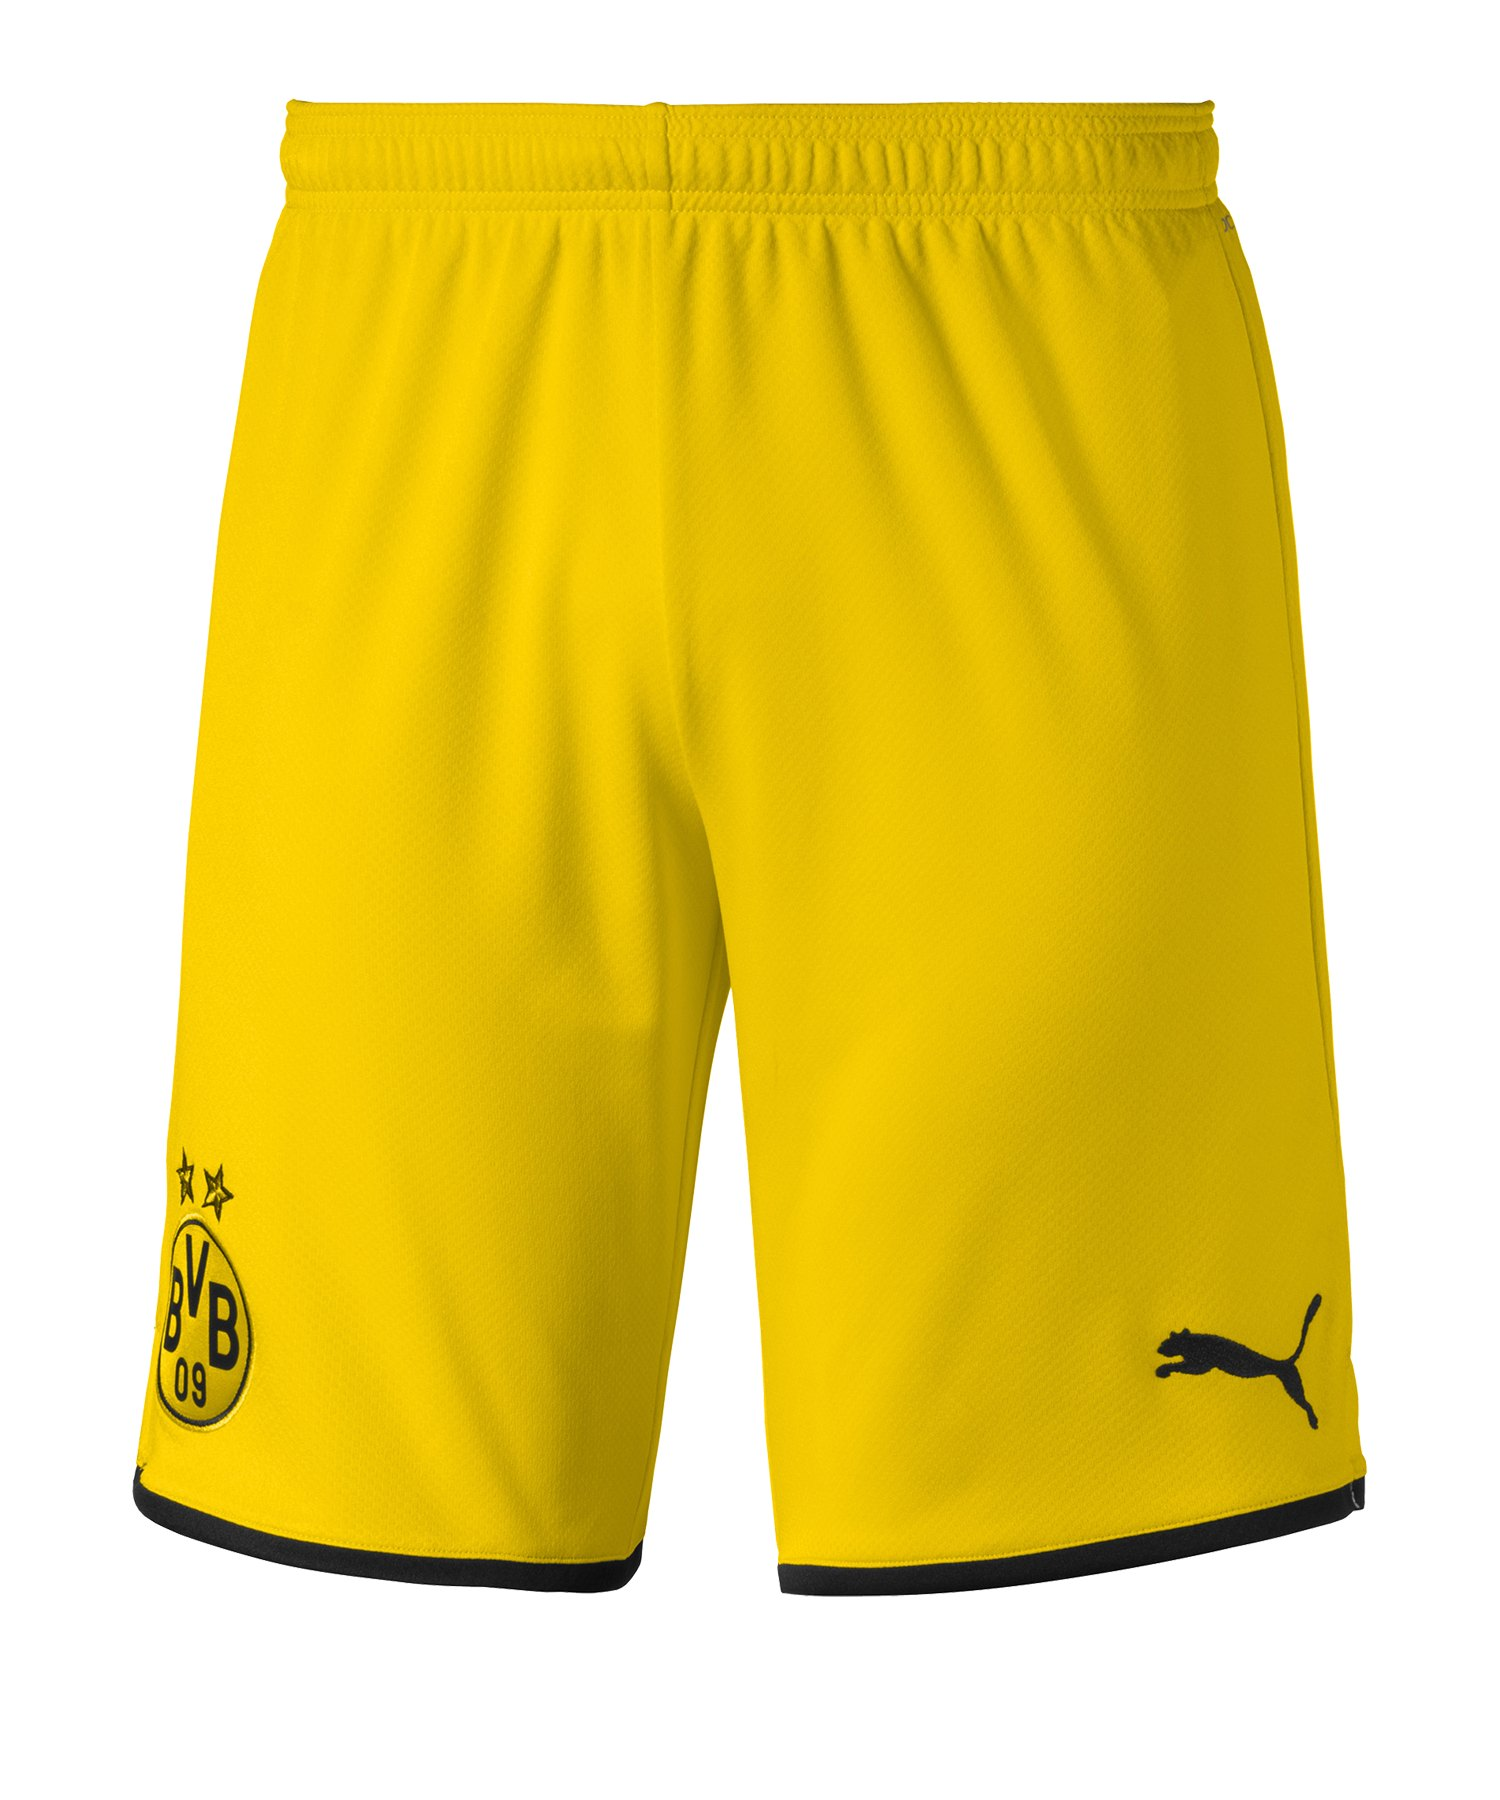 PUMA BVB Dortmund Short Home + UCL 2019/2020 Gelb F01 - Gelb